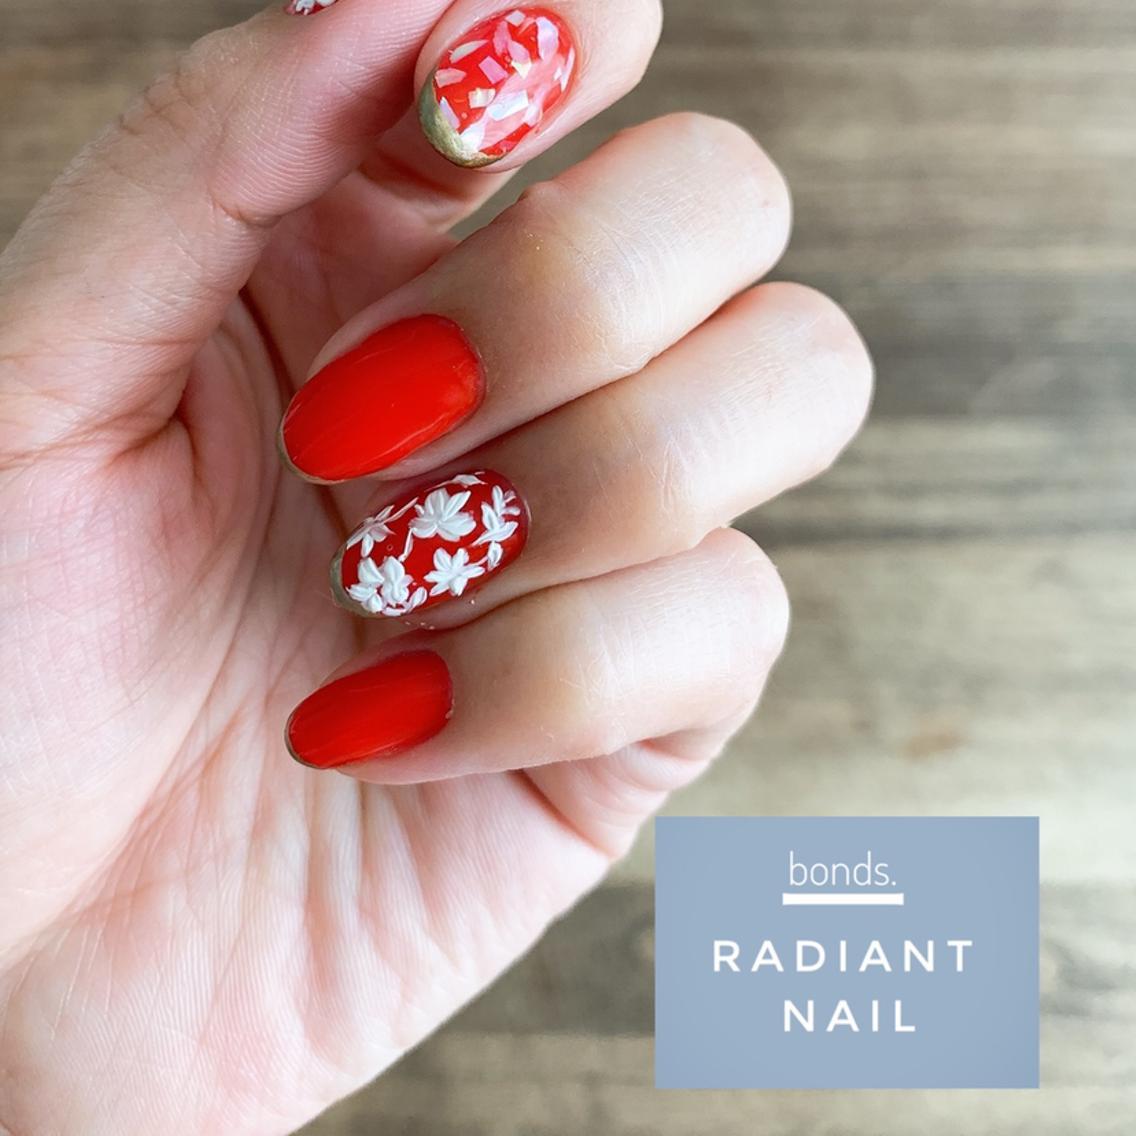 bonds.Radiant nail所属・Radiant nailの掲載